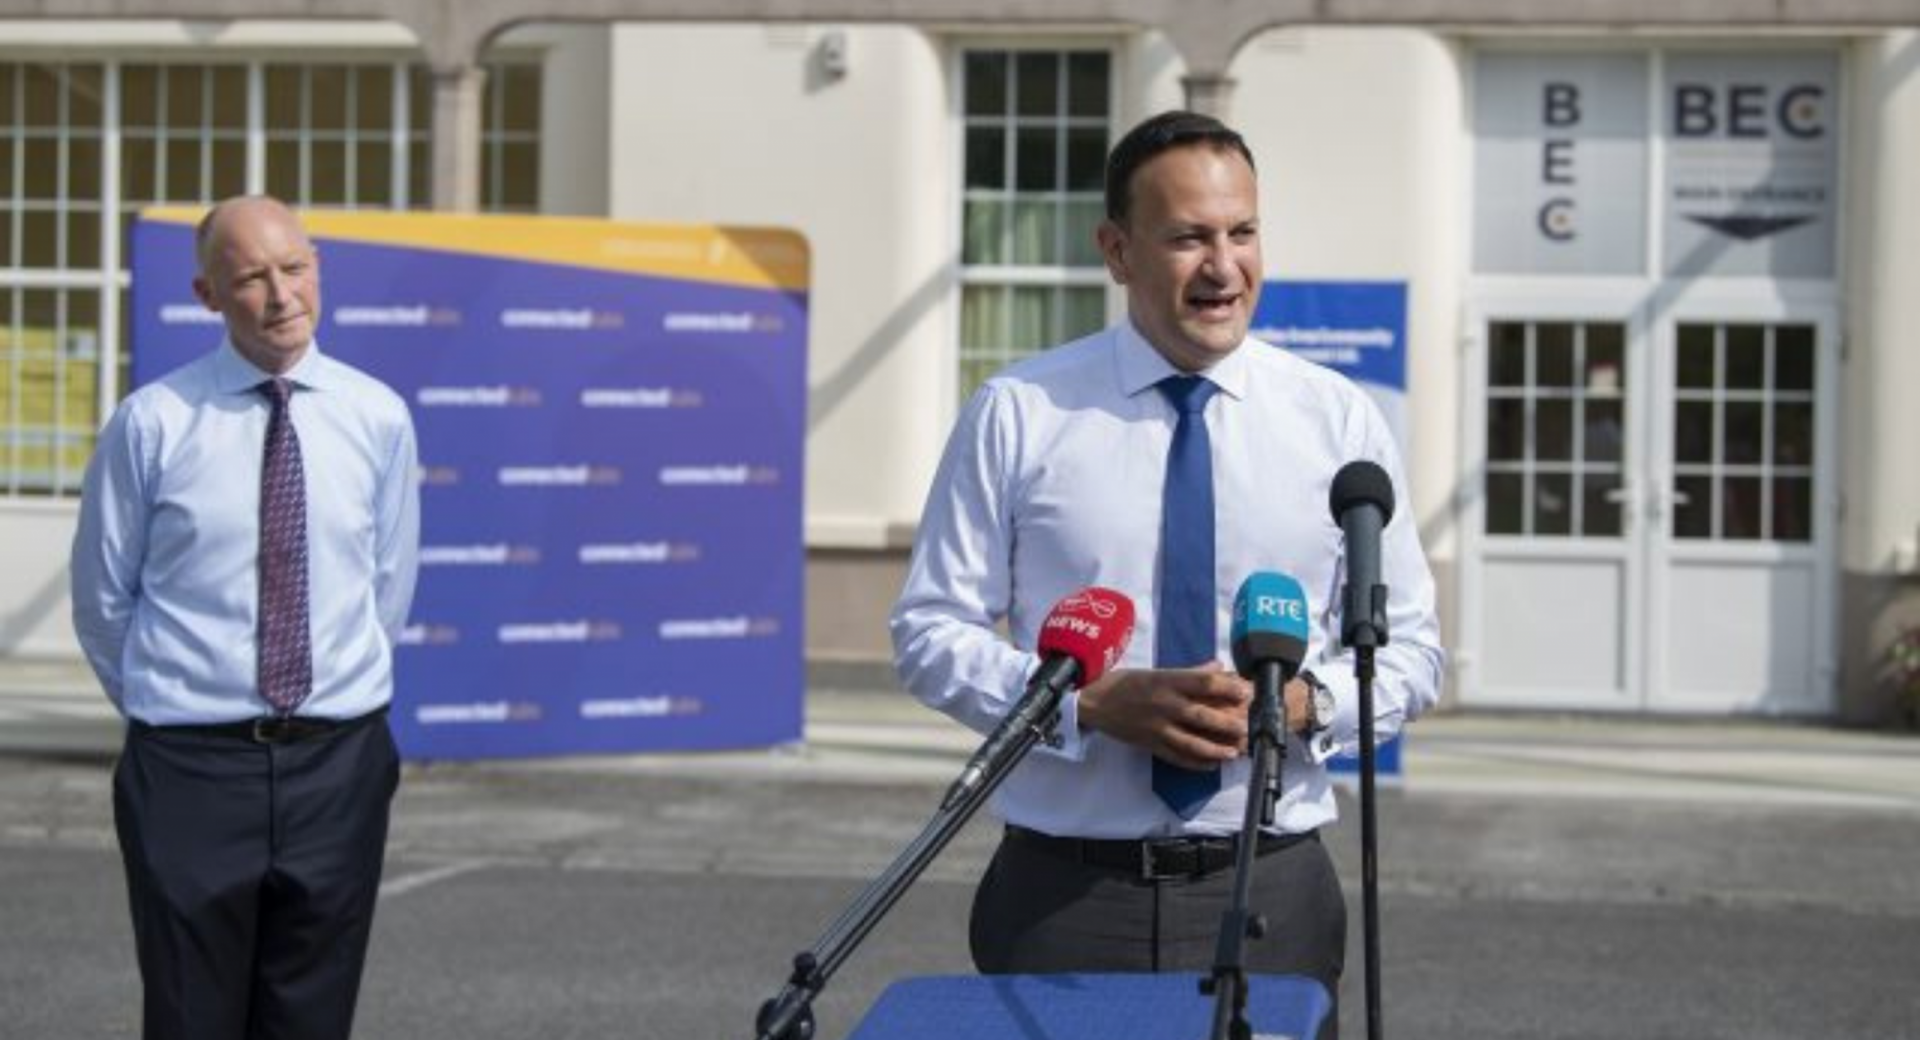 Leo Varadkar visits Connected Hub in Ballinasloe as part of Making Remote Work campaign